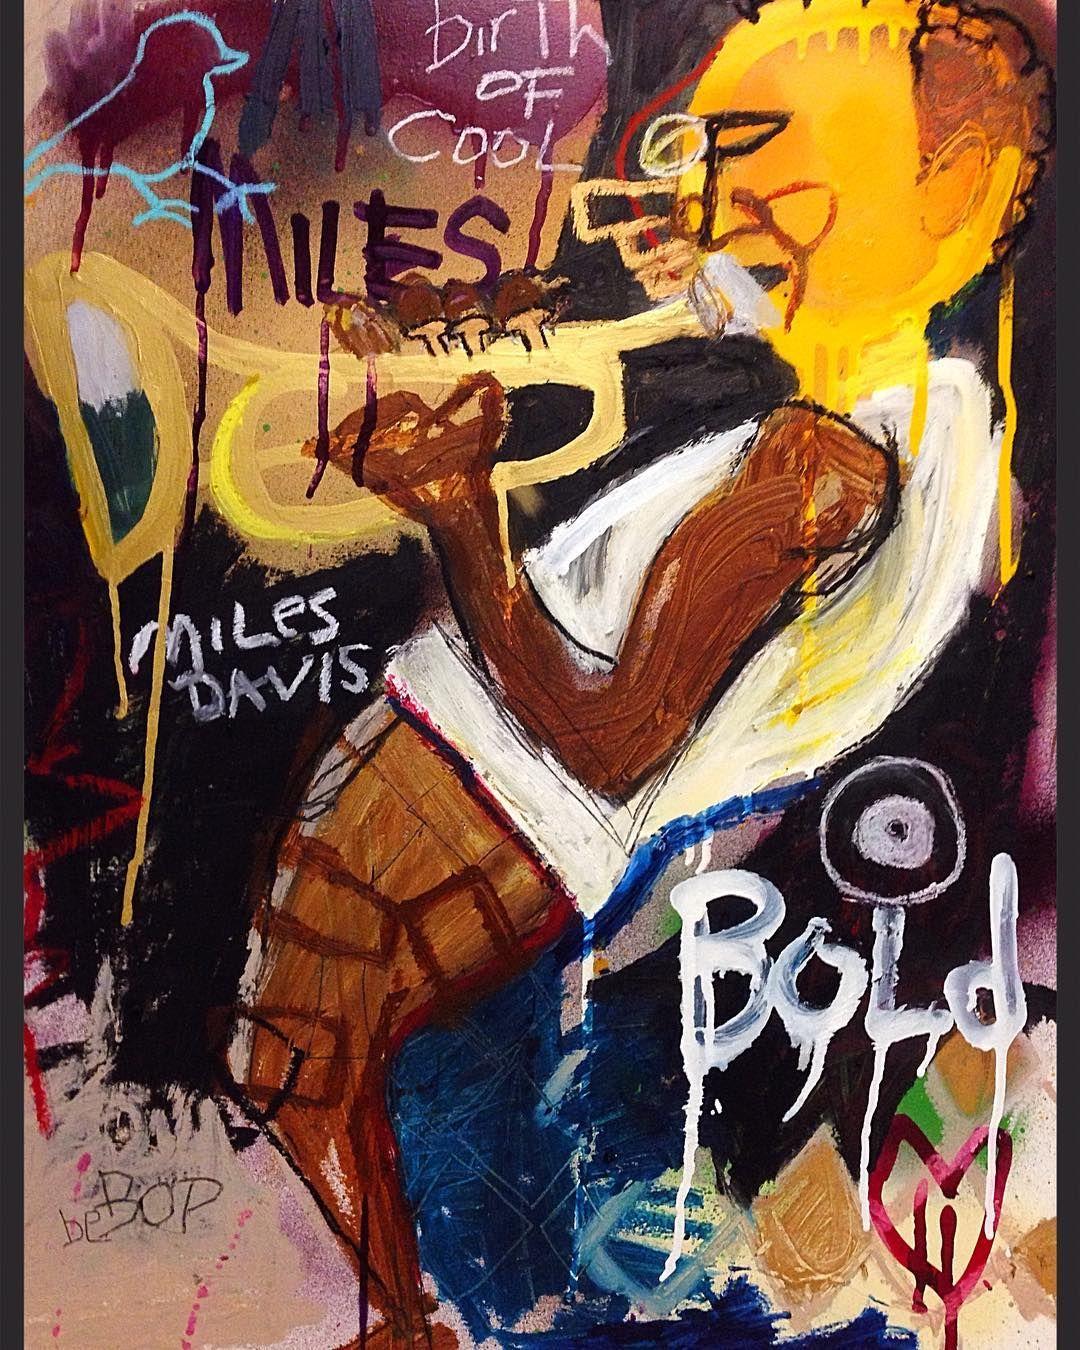 Birth of cool. #michaelscottrichardson #jelly #mixedmedia #artlife #modernart #contemporaryart #lifeisbeautiful #urbanart #spraypaint #fineart #artgallery #artschool #artbasel #paint #painter #graffiti #guerillaart #creativity #streetart #dailyart #oilpainting #artiststudio #artist#neoexpressionism #abstractexpressionism #heart#creative #abstract #artoftheday #artpop by michaelscottrichardson